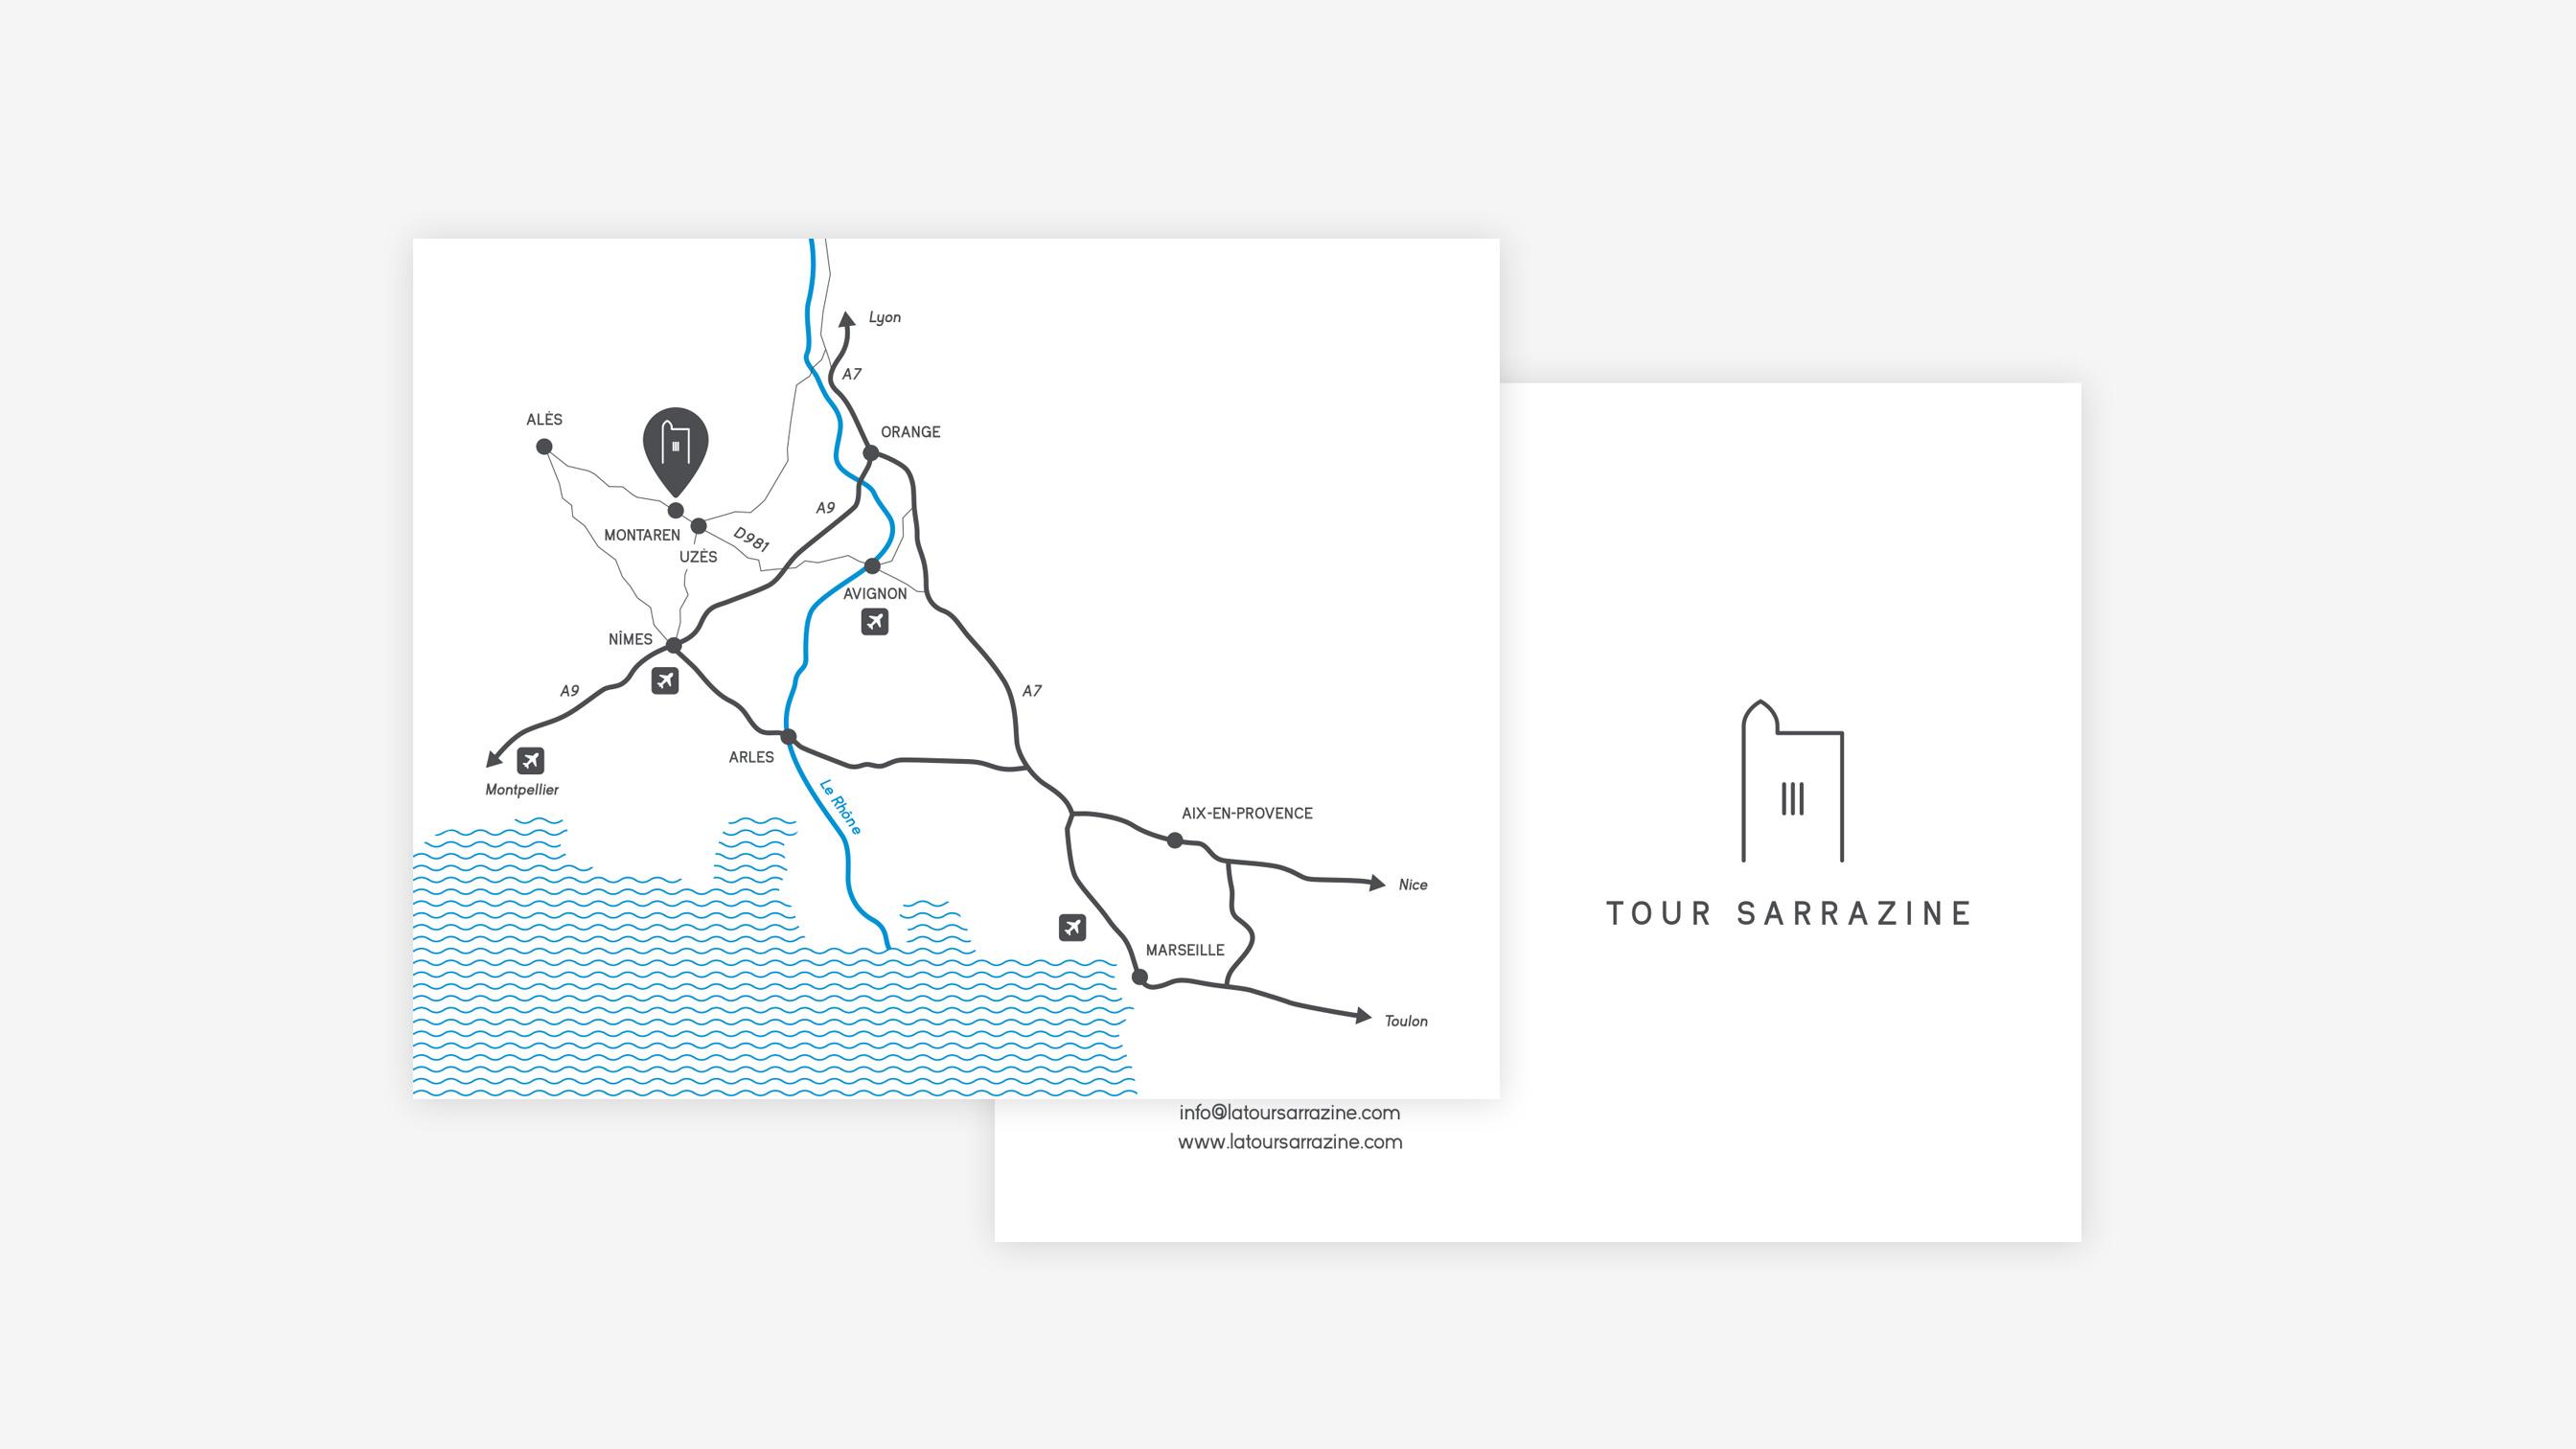 08-tour-sarrazine-pikteo-webdesign-graphic-design-freelance-paris-bruxelles-londres